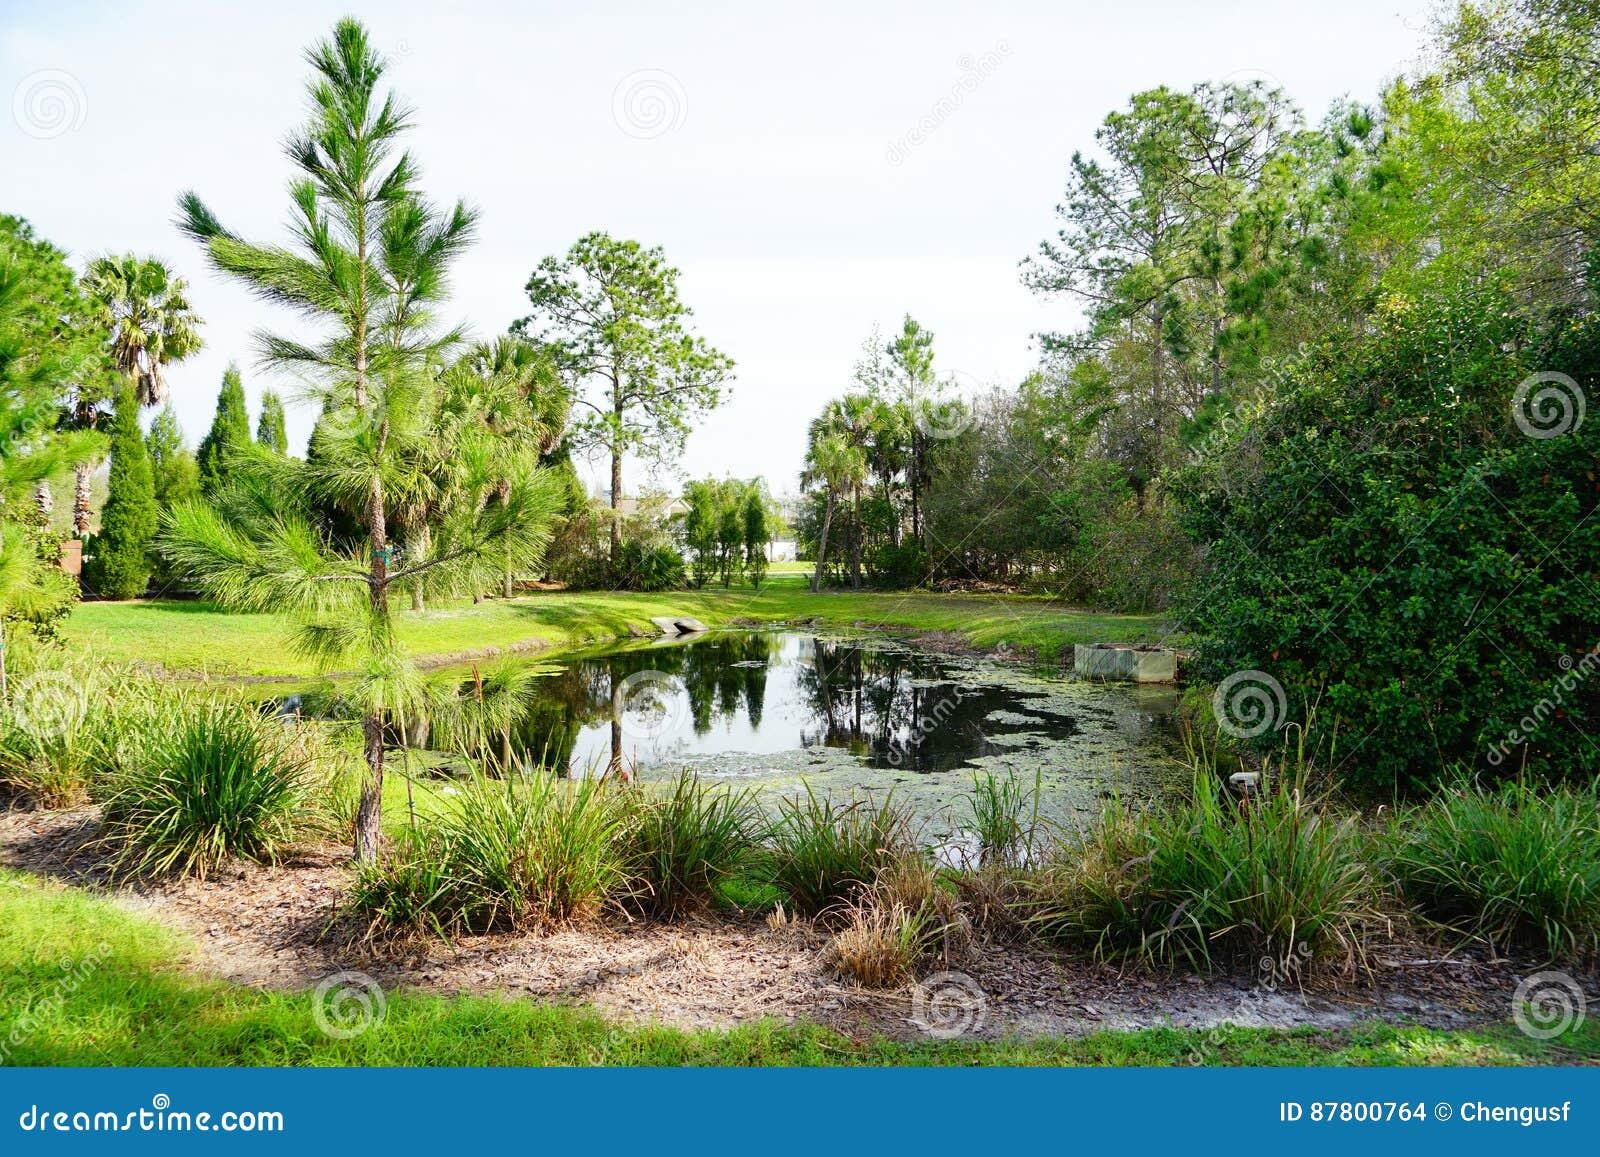 Tampa gömma i handflatan gemenskap